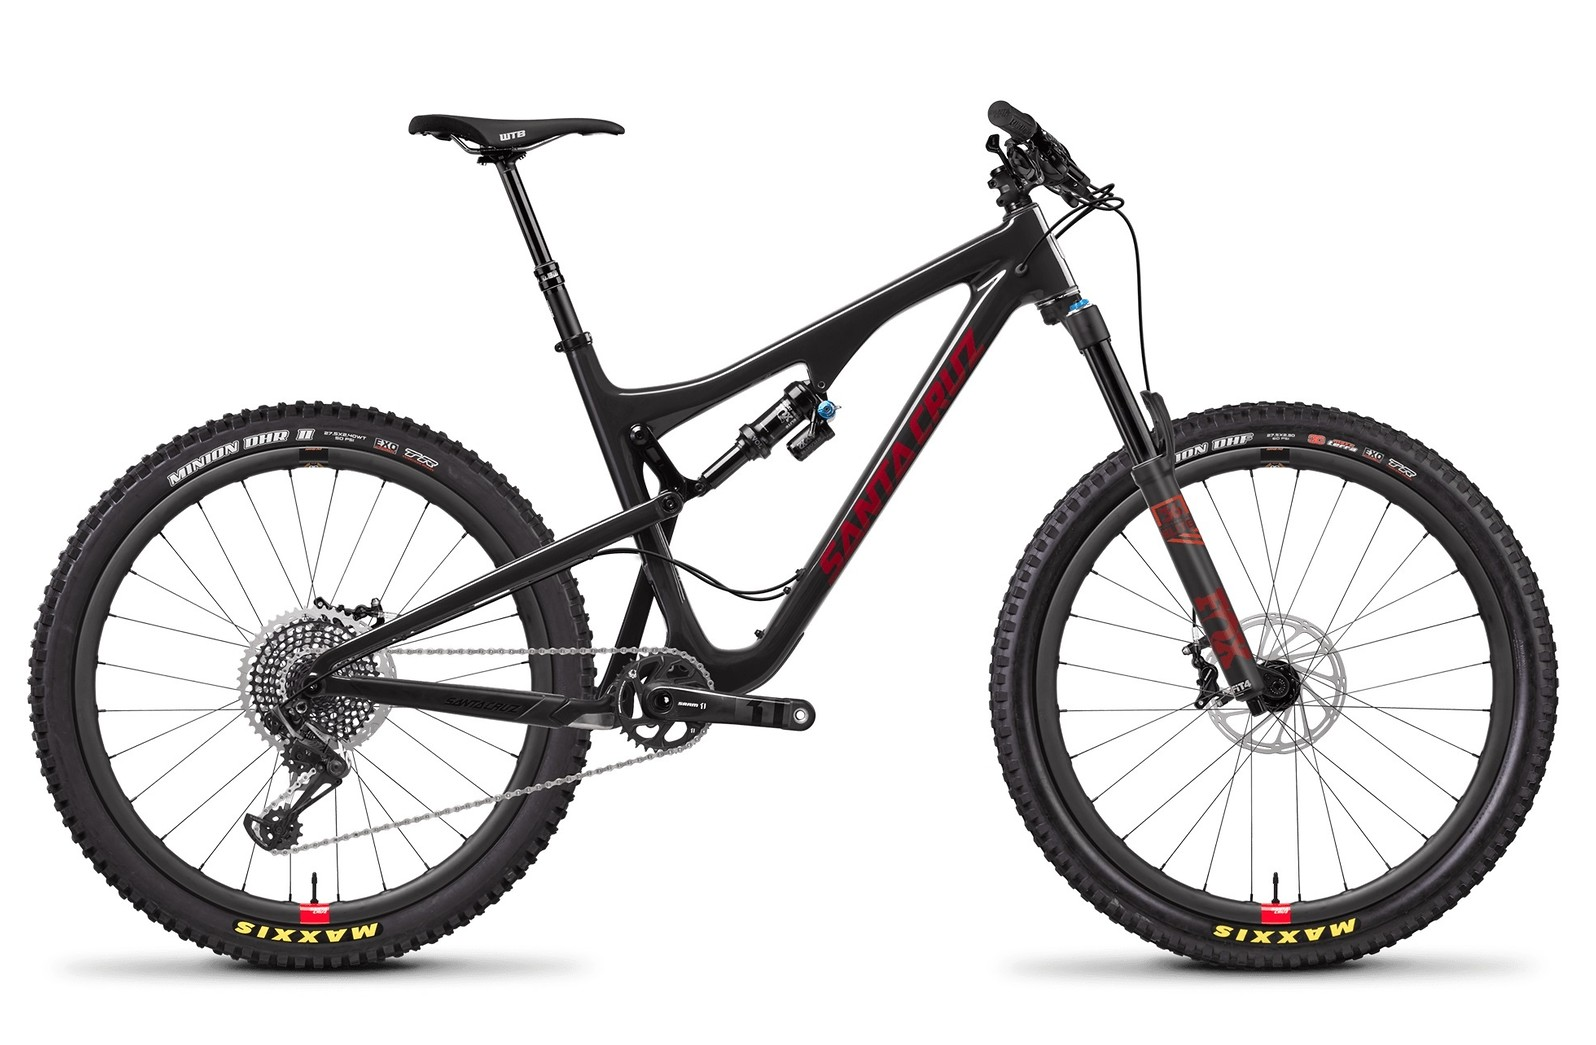 Bronson Carbon CC X01 Gloss Black and Siracha w Reserve Wheel Upgrade